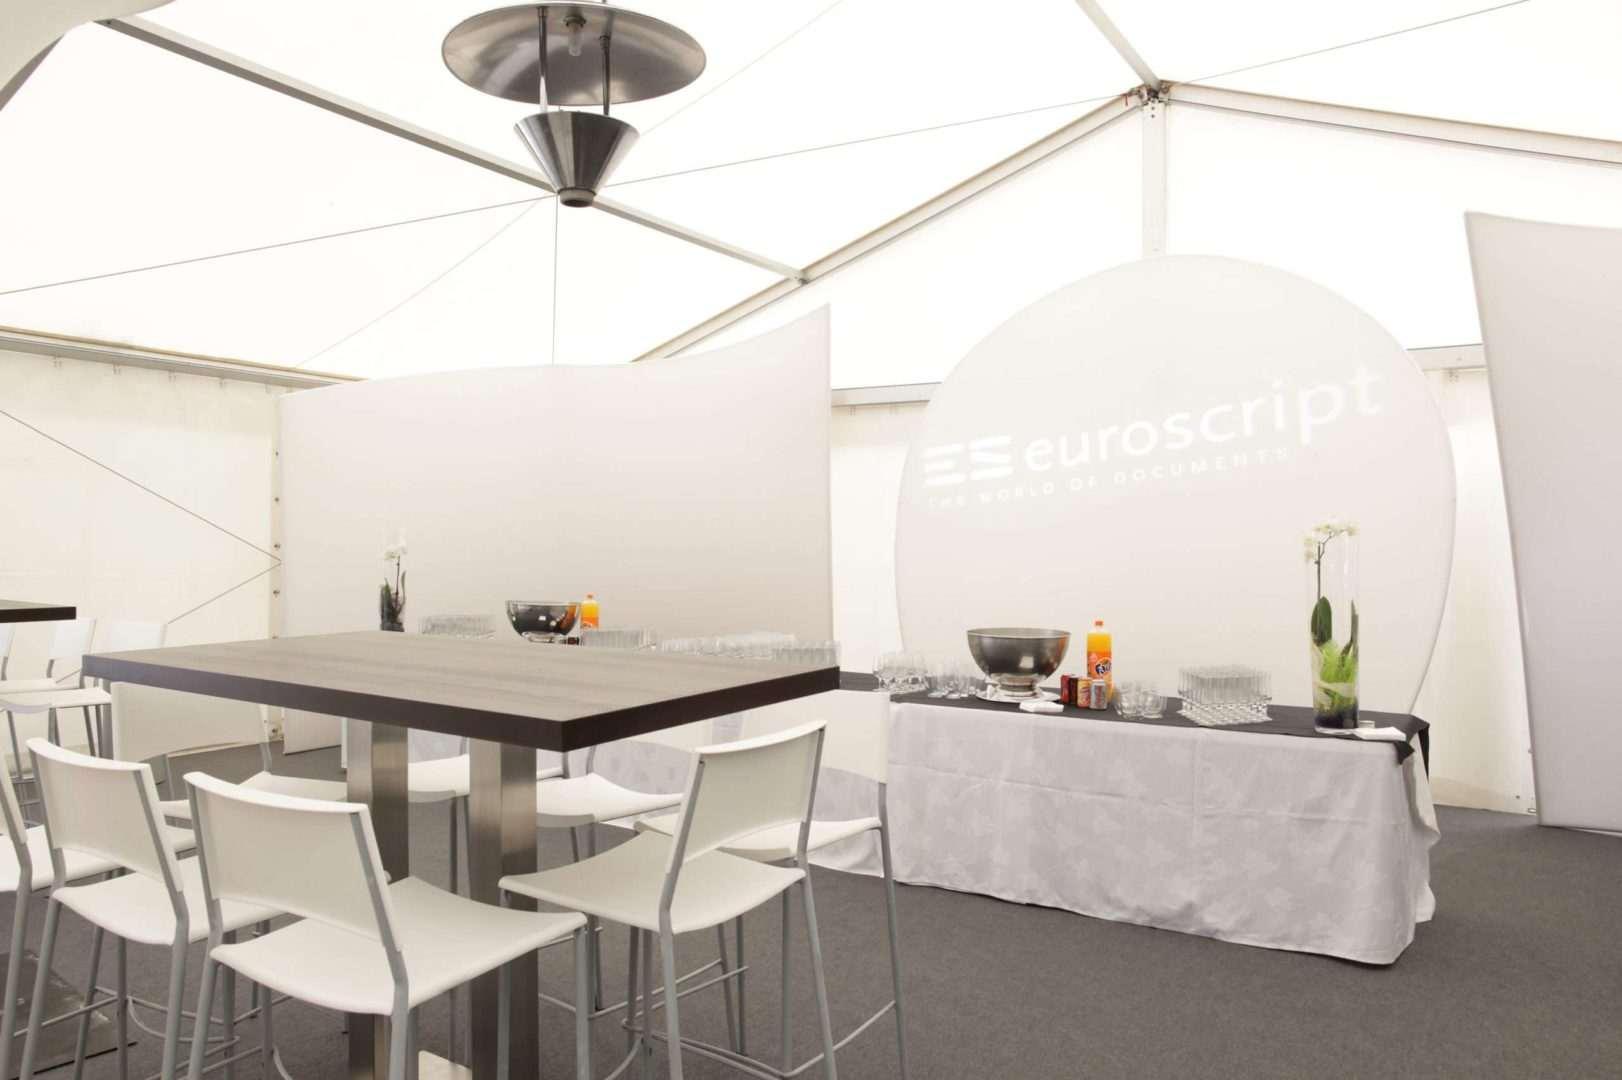 25-ans-euroscript-2009-carte-blanche-events